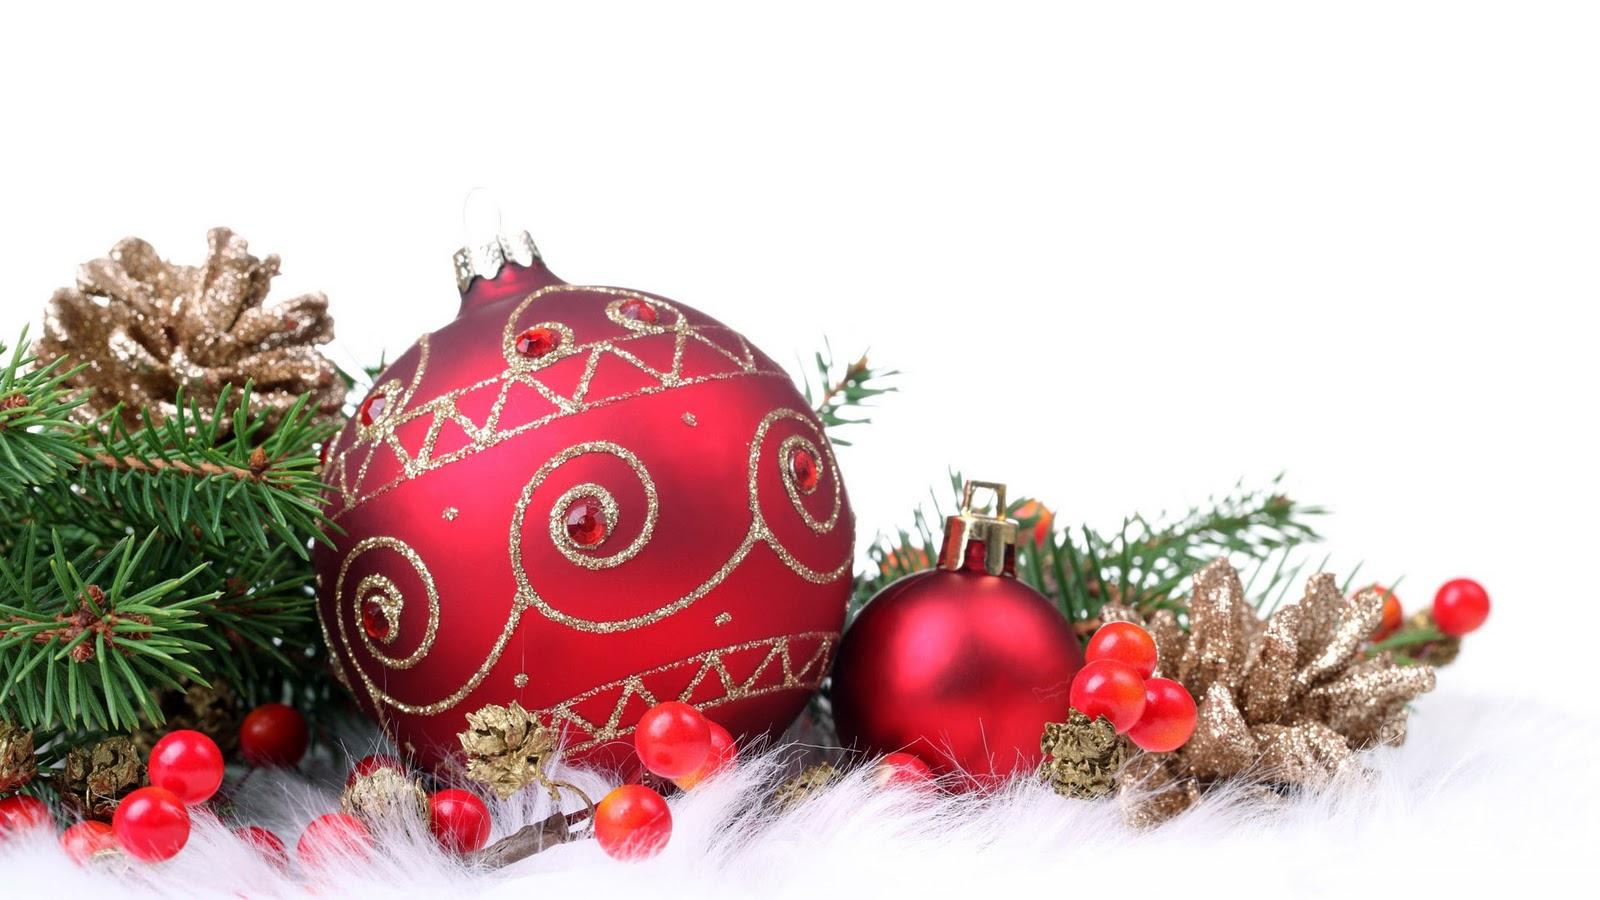 Kerst achtergronden hd wallpapers - Nostalgische weihnachtskugeln ...